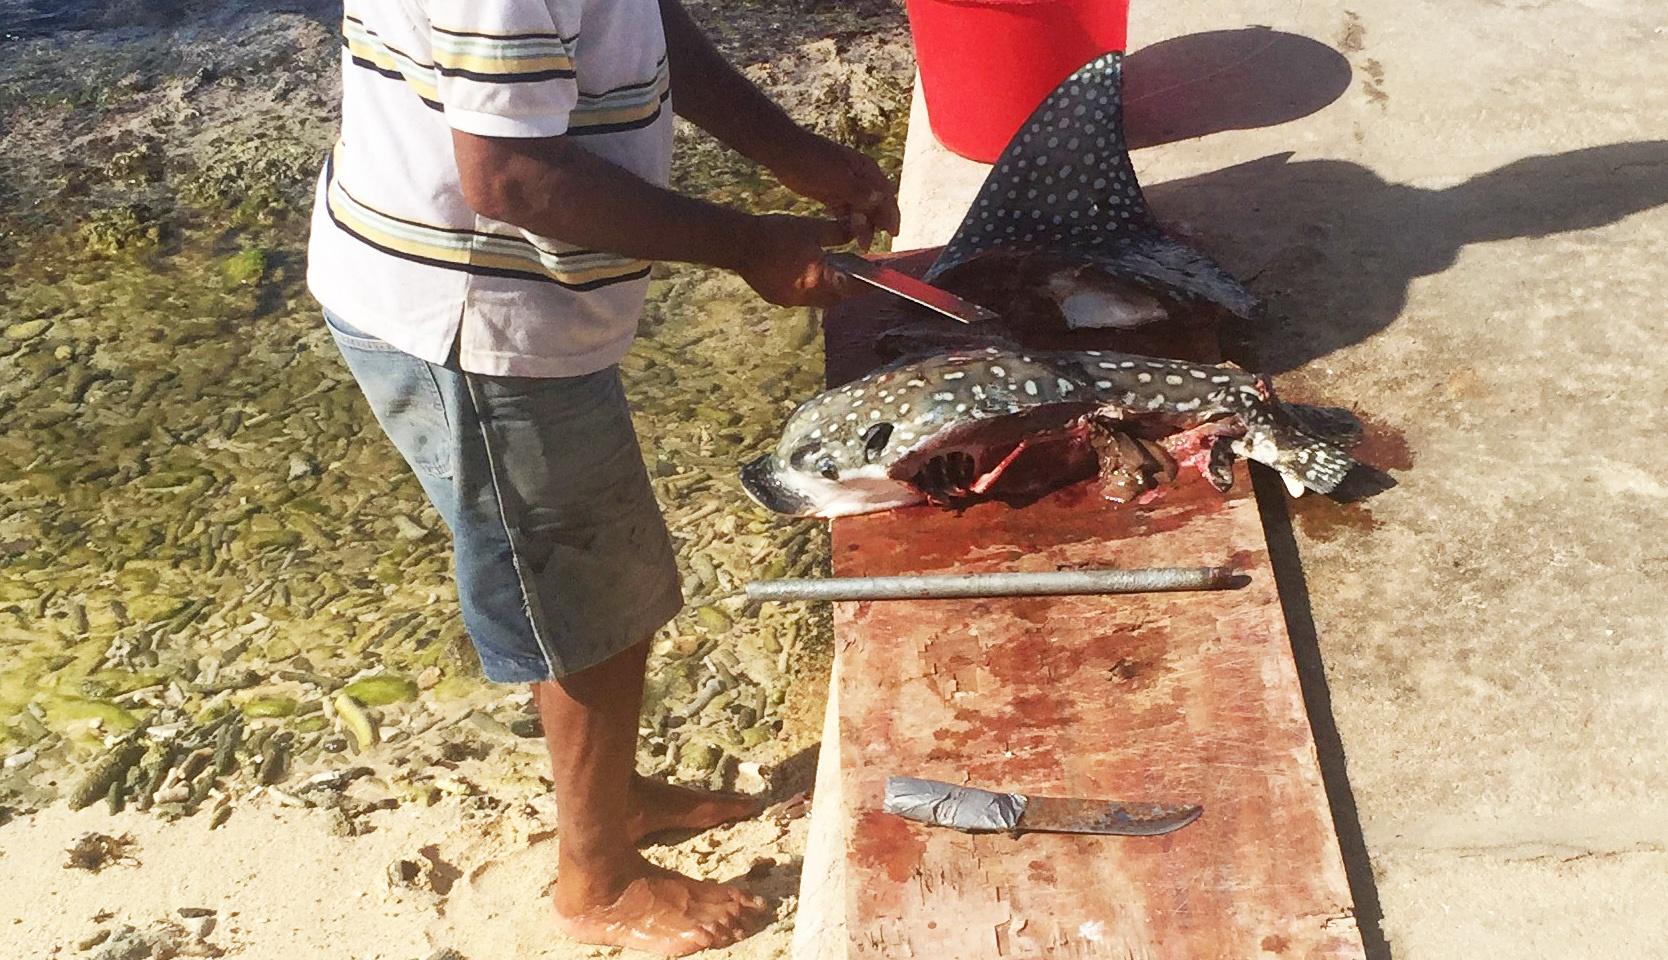 Protected Species Caught by Venezuelan Fisherman